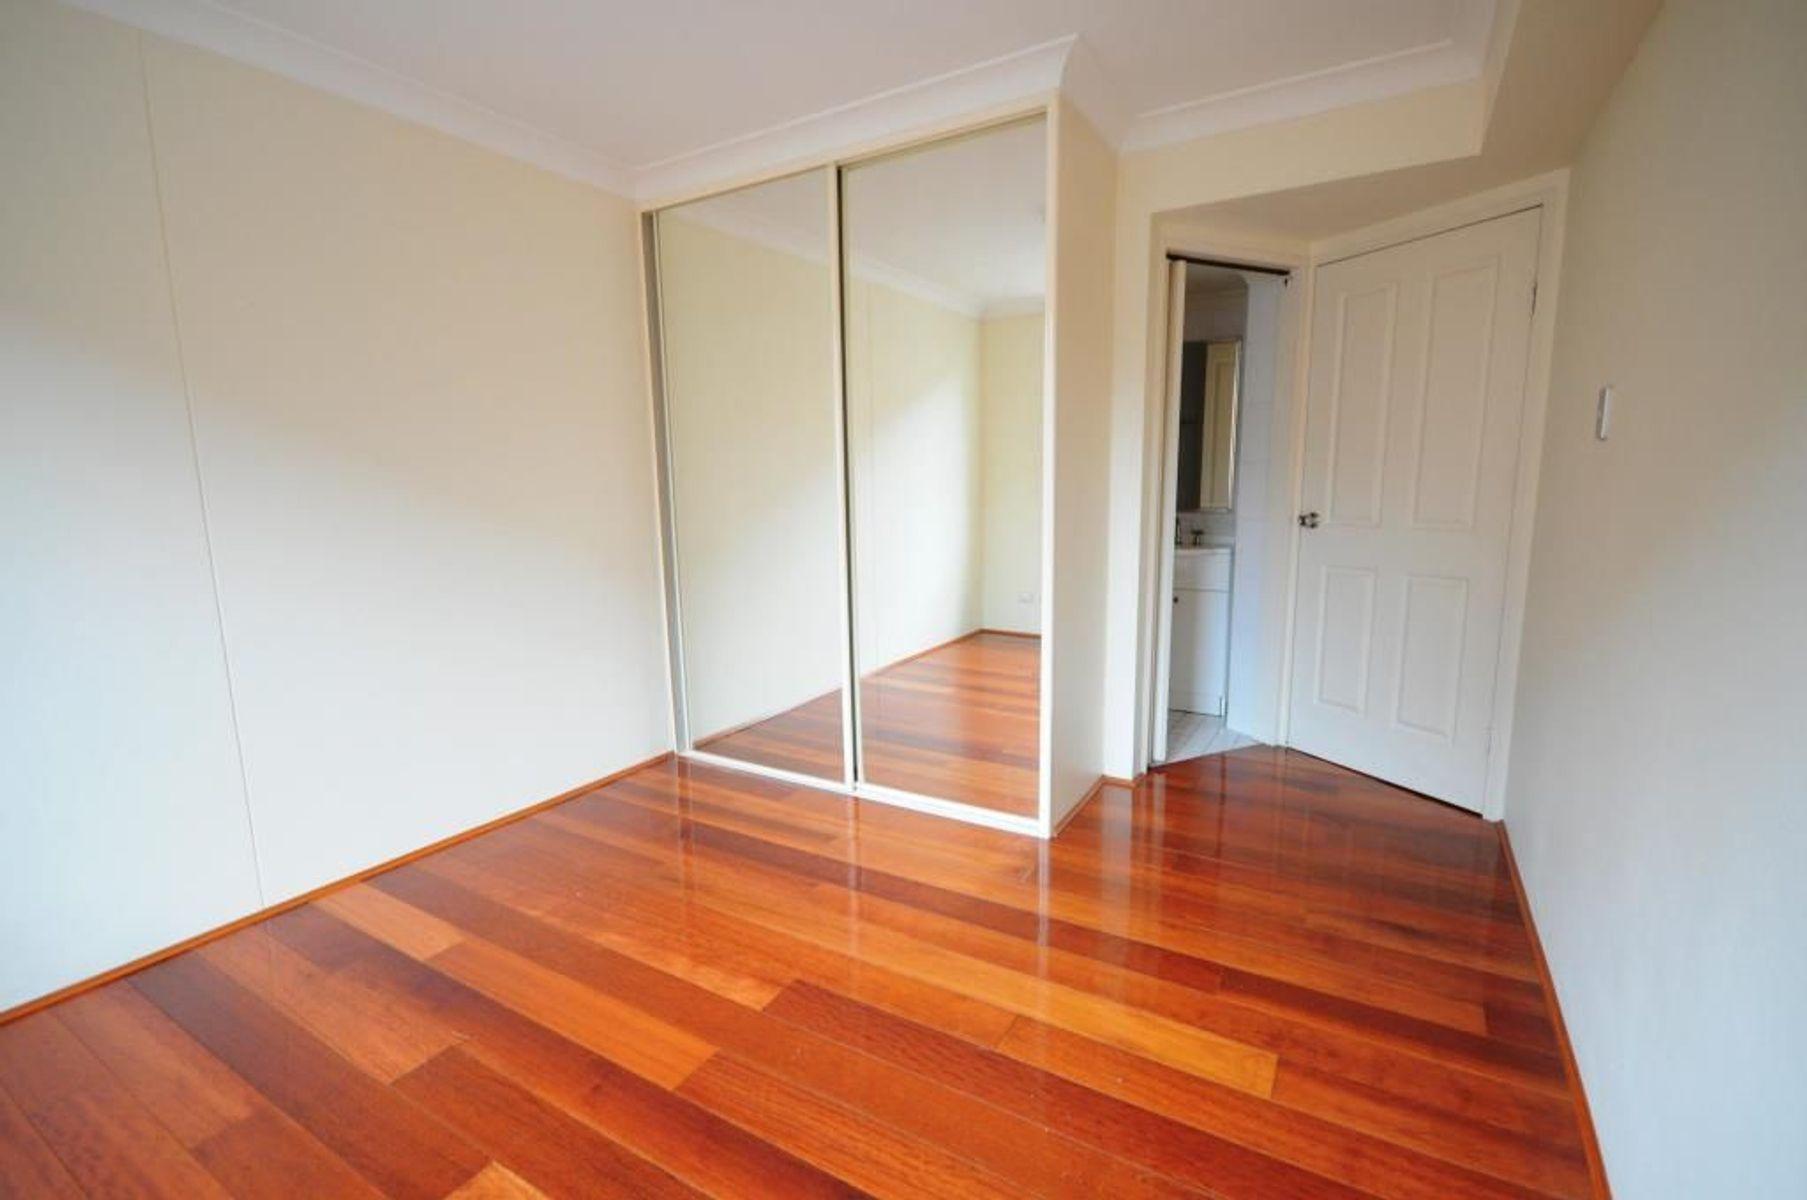 23/18 Sorrell Street, Parramatta, NSW 2150